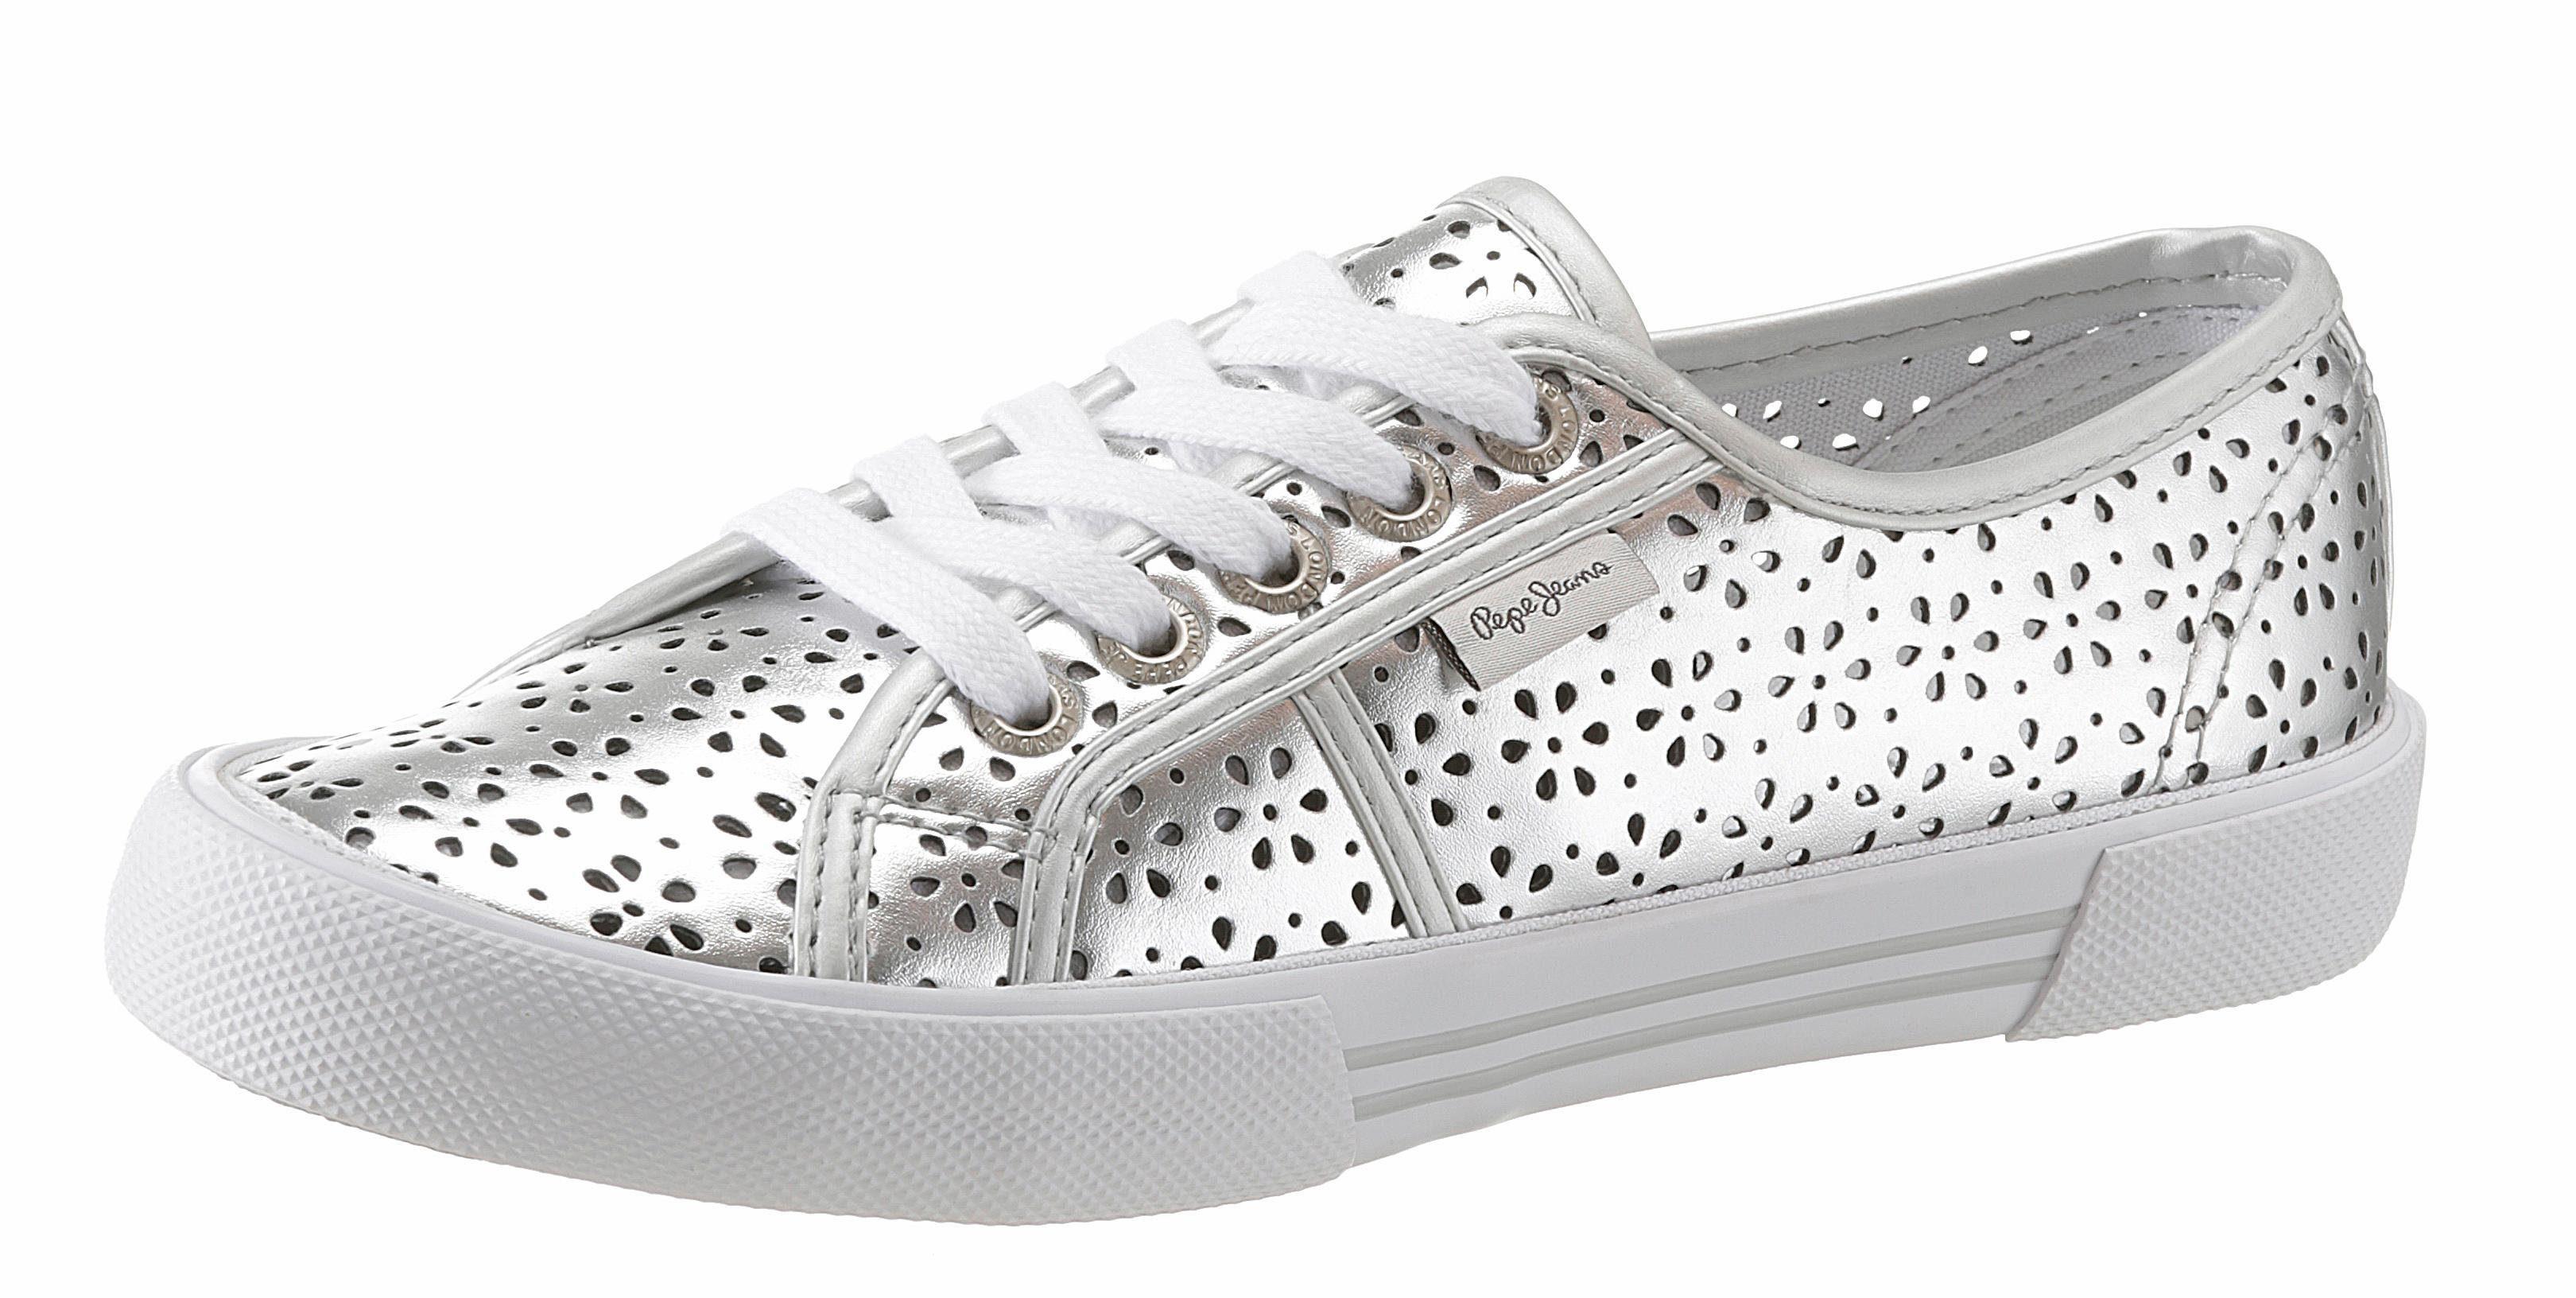 Pepe Jeans ABERLADY DAISY Sneaker, mit sommerlichem Lasercut online kaufen  silberfarben